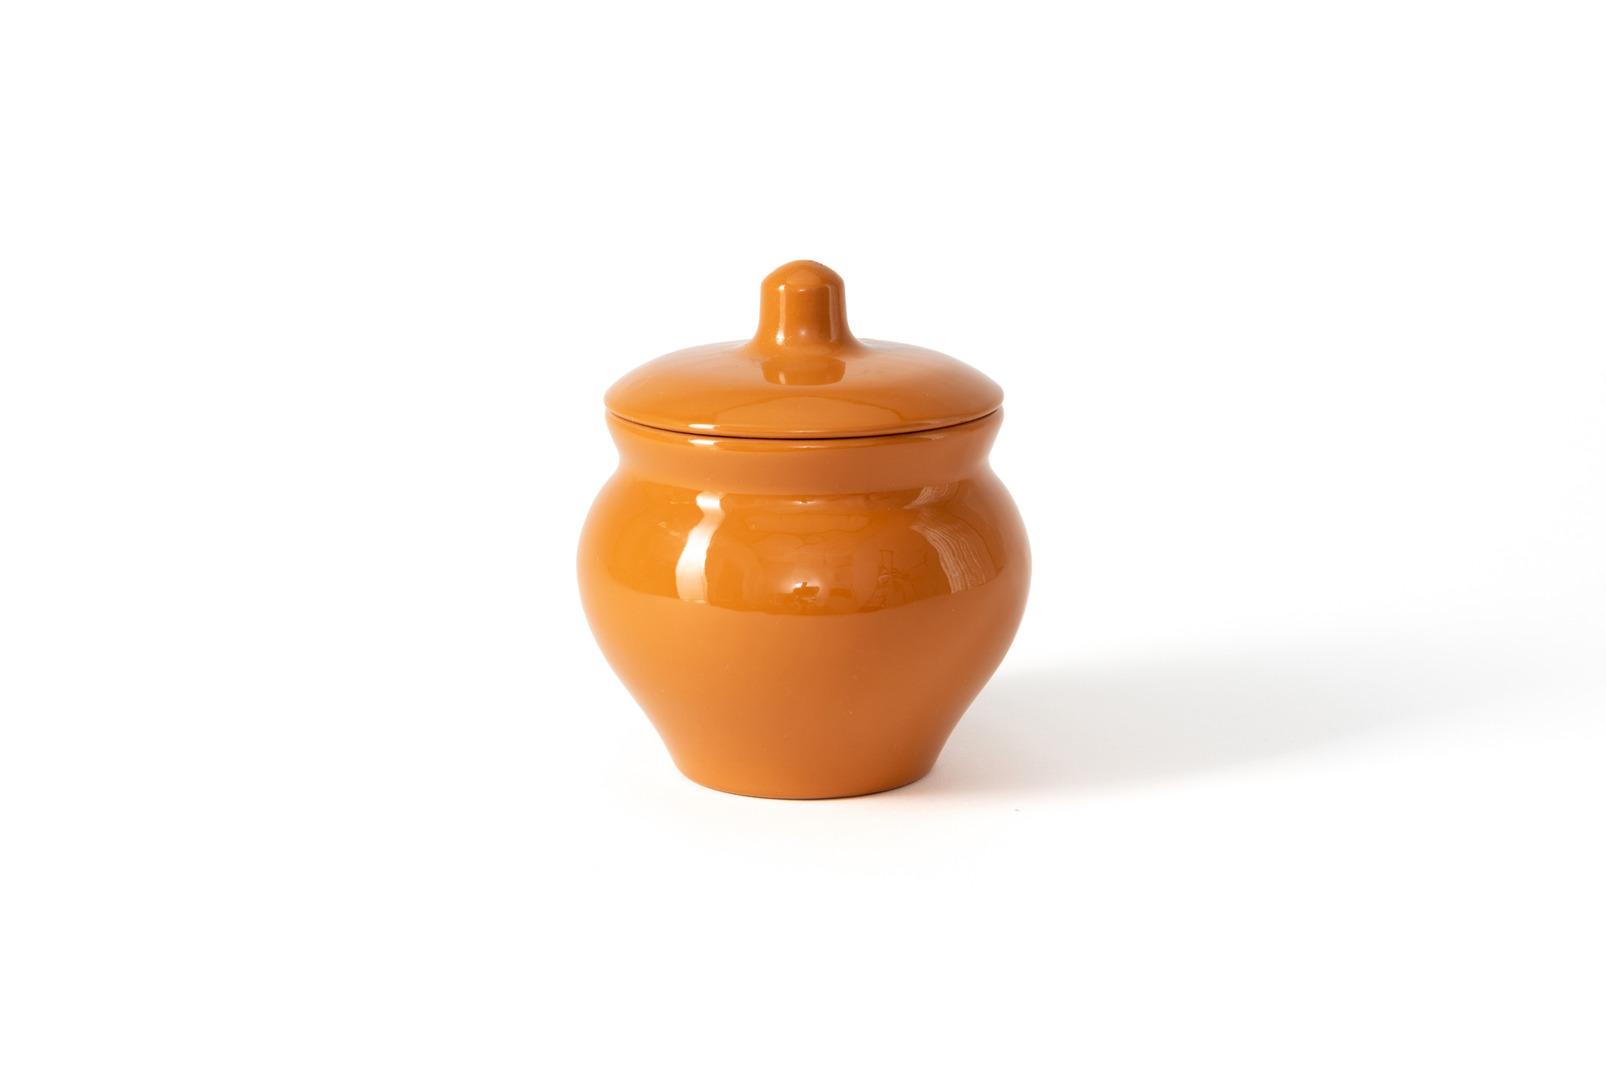 Glazed terracota pot with a lid